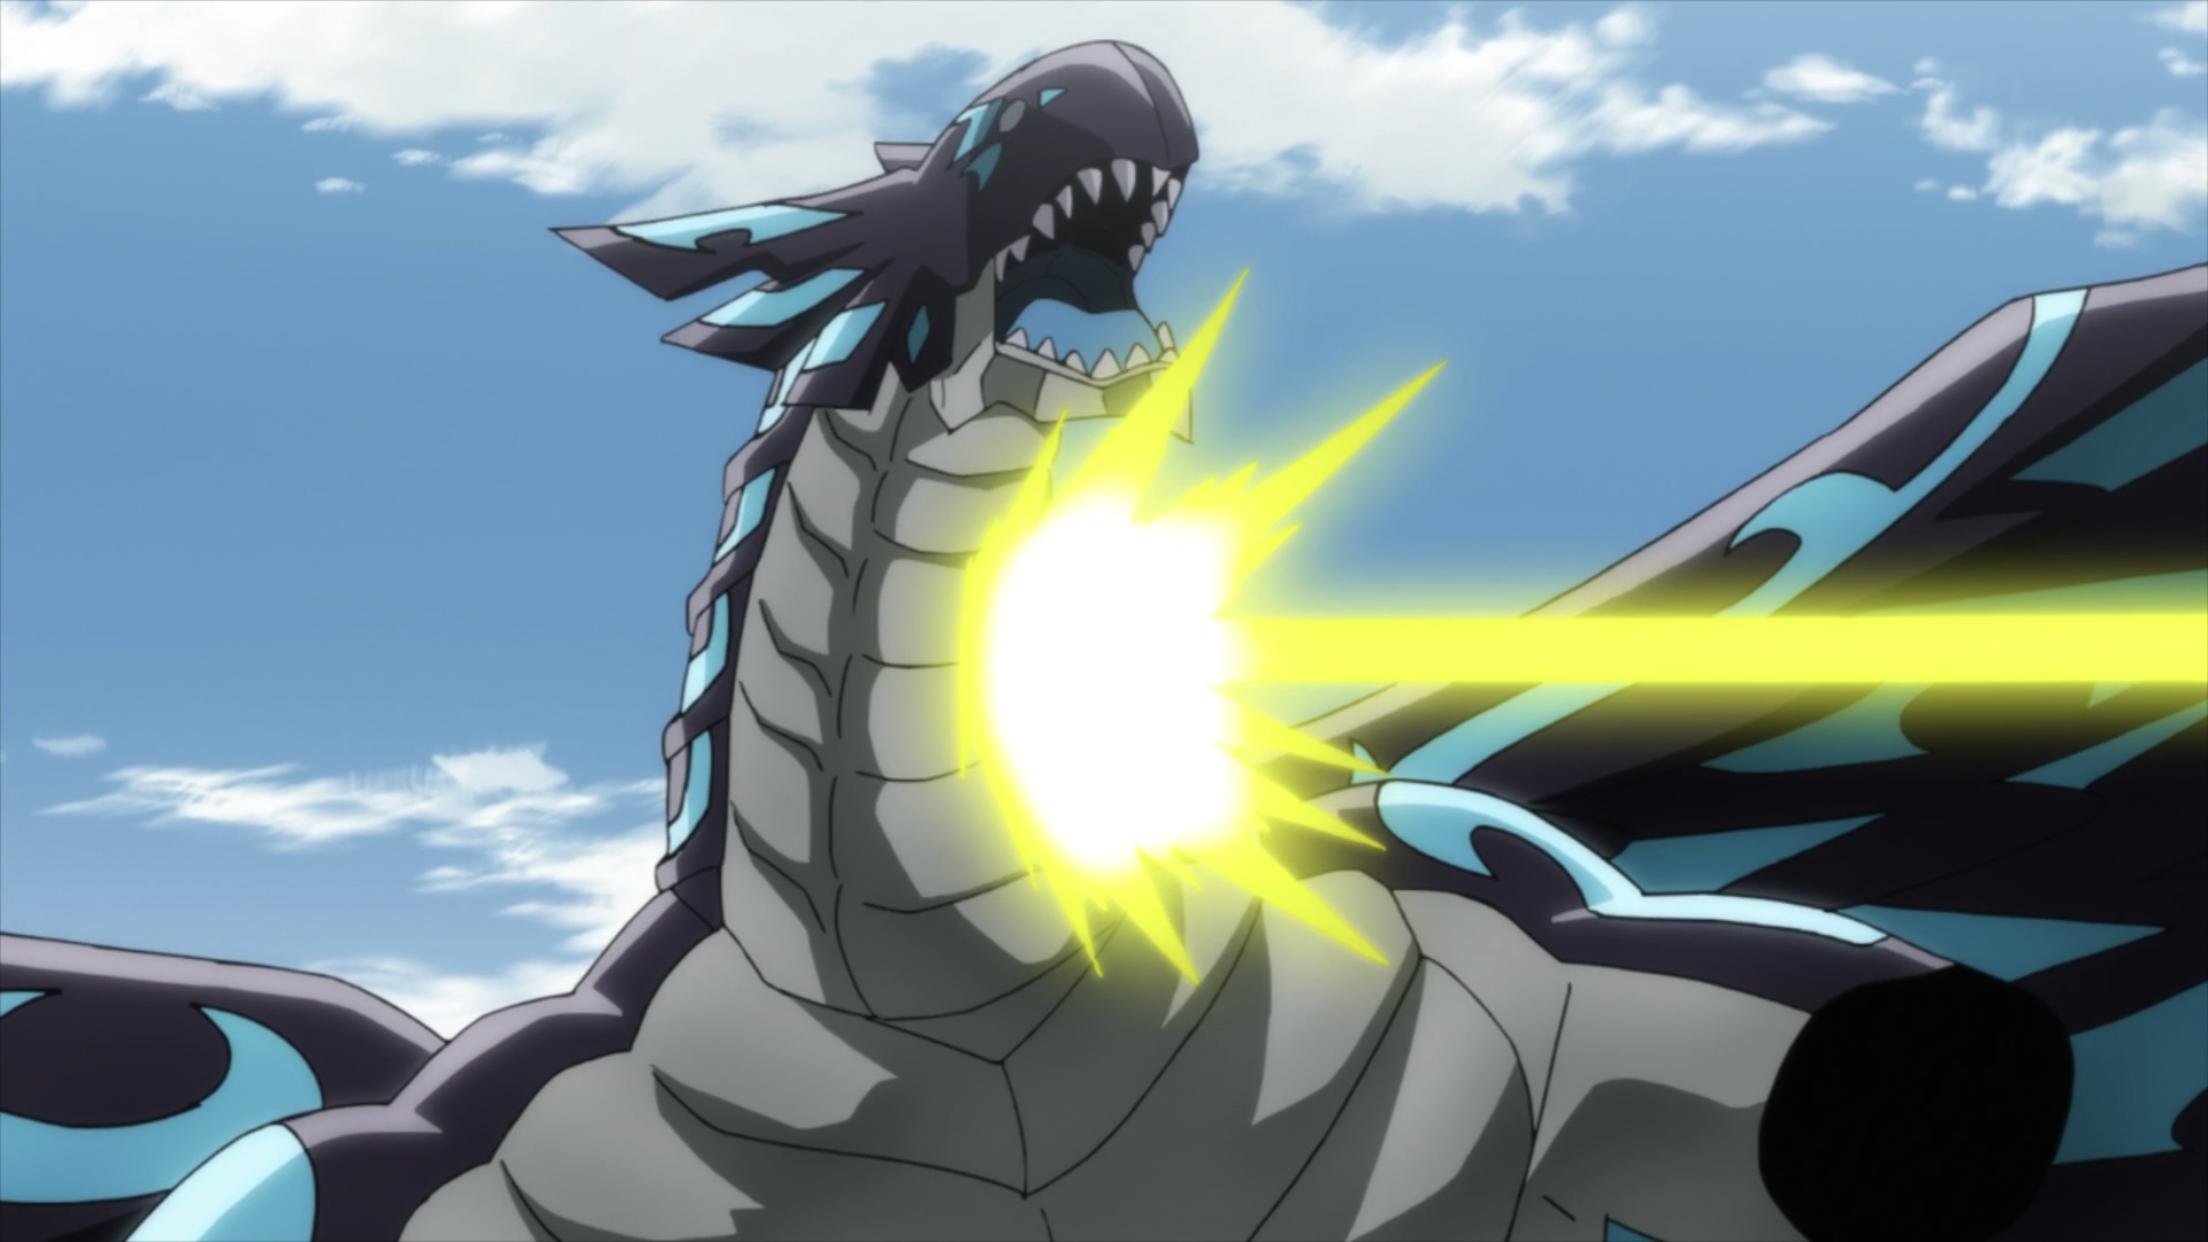 Fairy Tail 2018 Episode 45 Fairy, Fairy tail, Dragon king